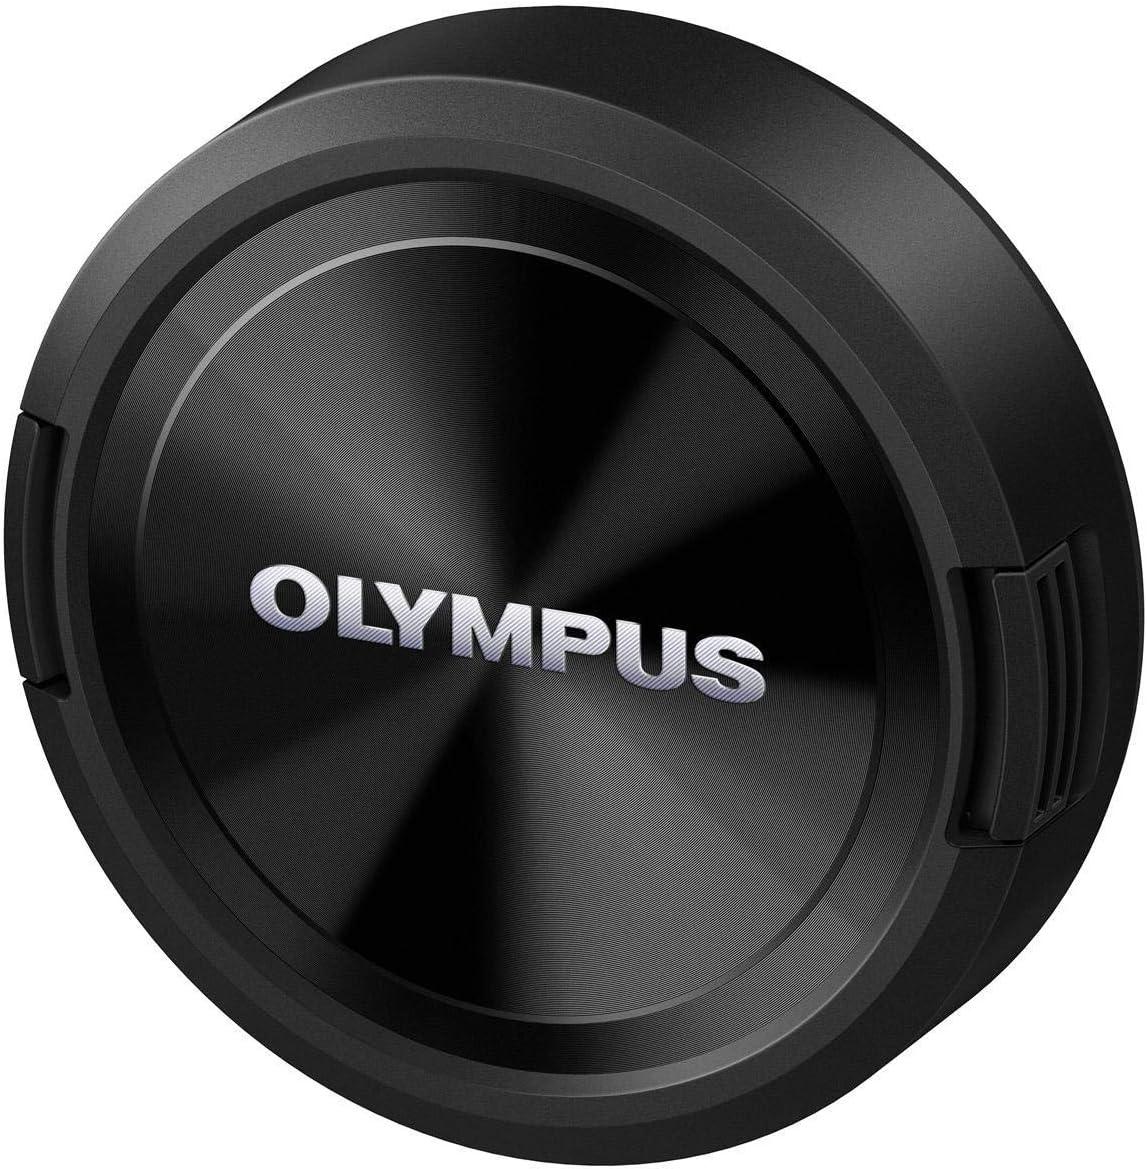 Olympus Low price Max 65% OFF 79 mm Lens Cap 14 7 for Pro ED